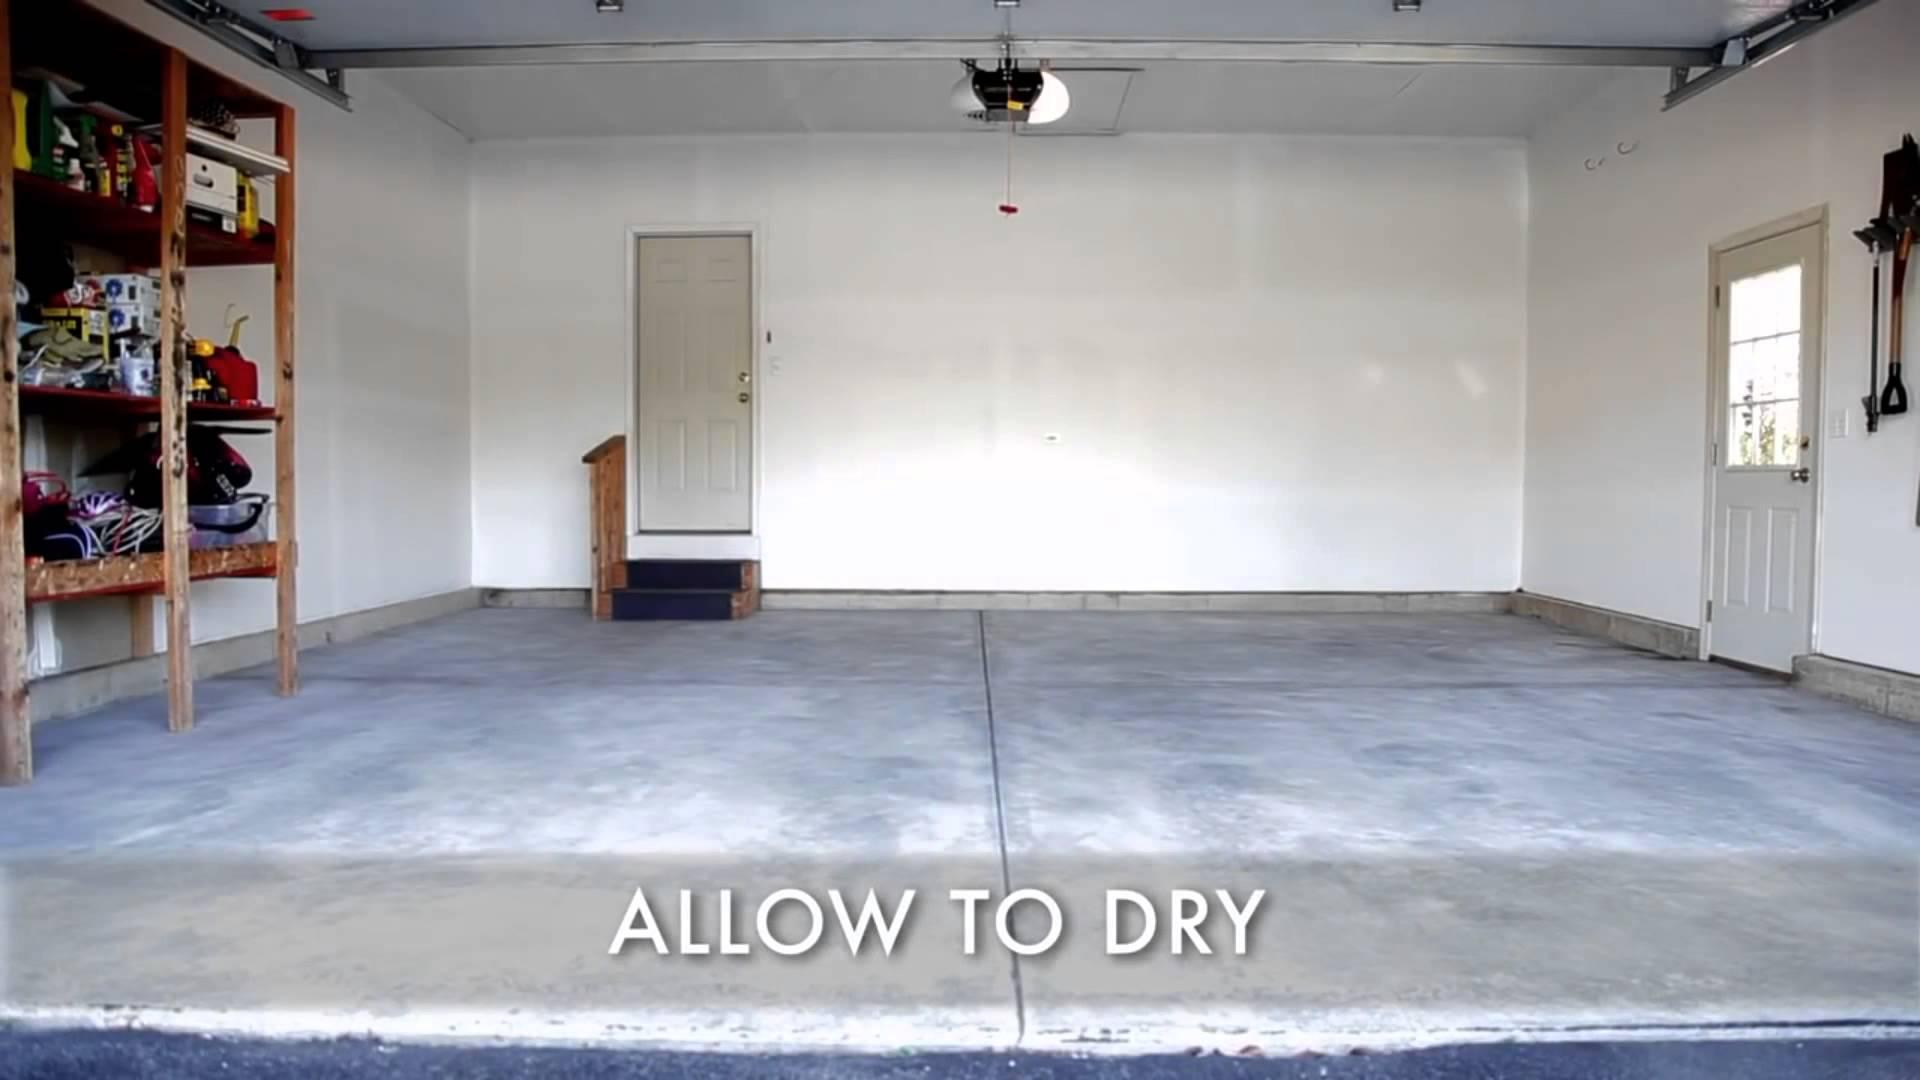 How to Use Rust Oleum Epoxyshield Garage Floor Coating Kit to ...